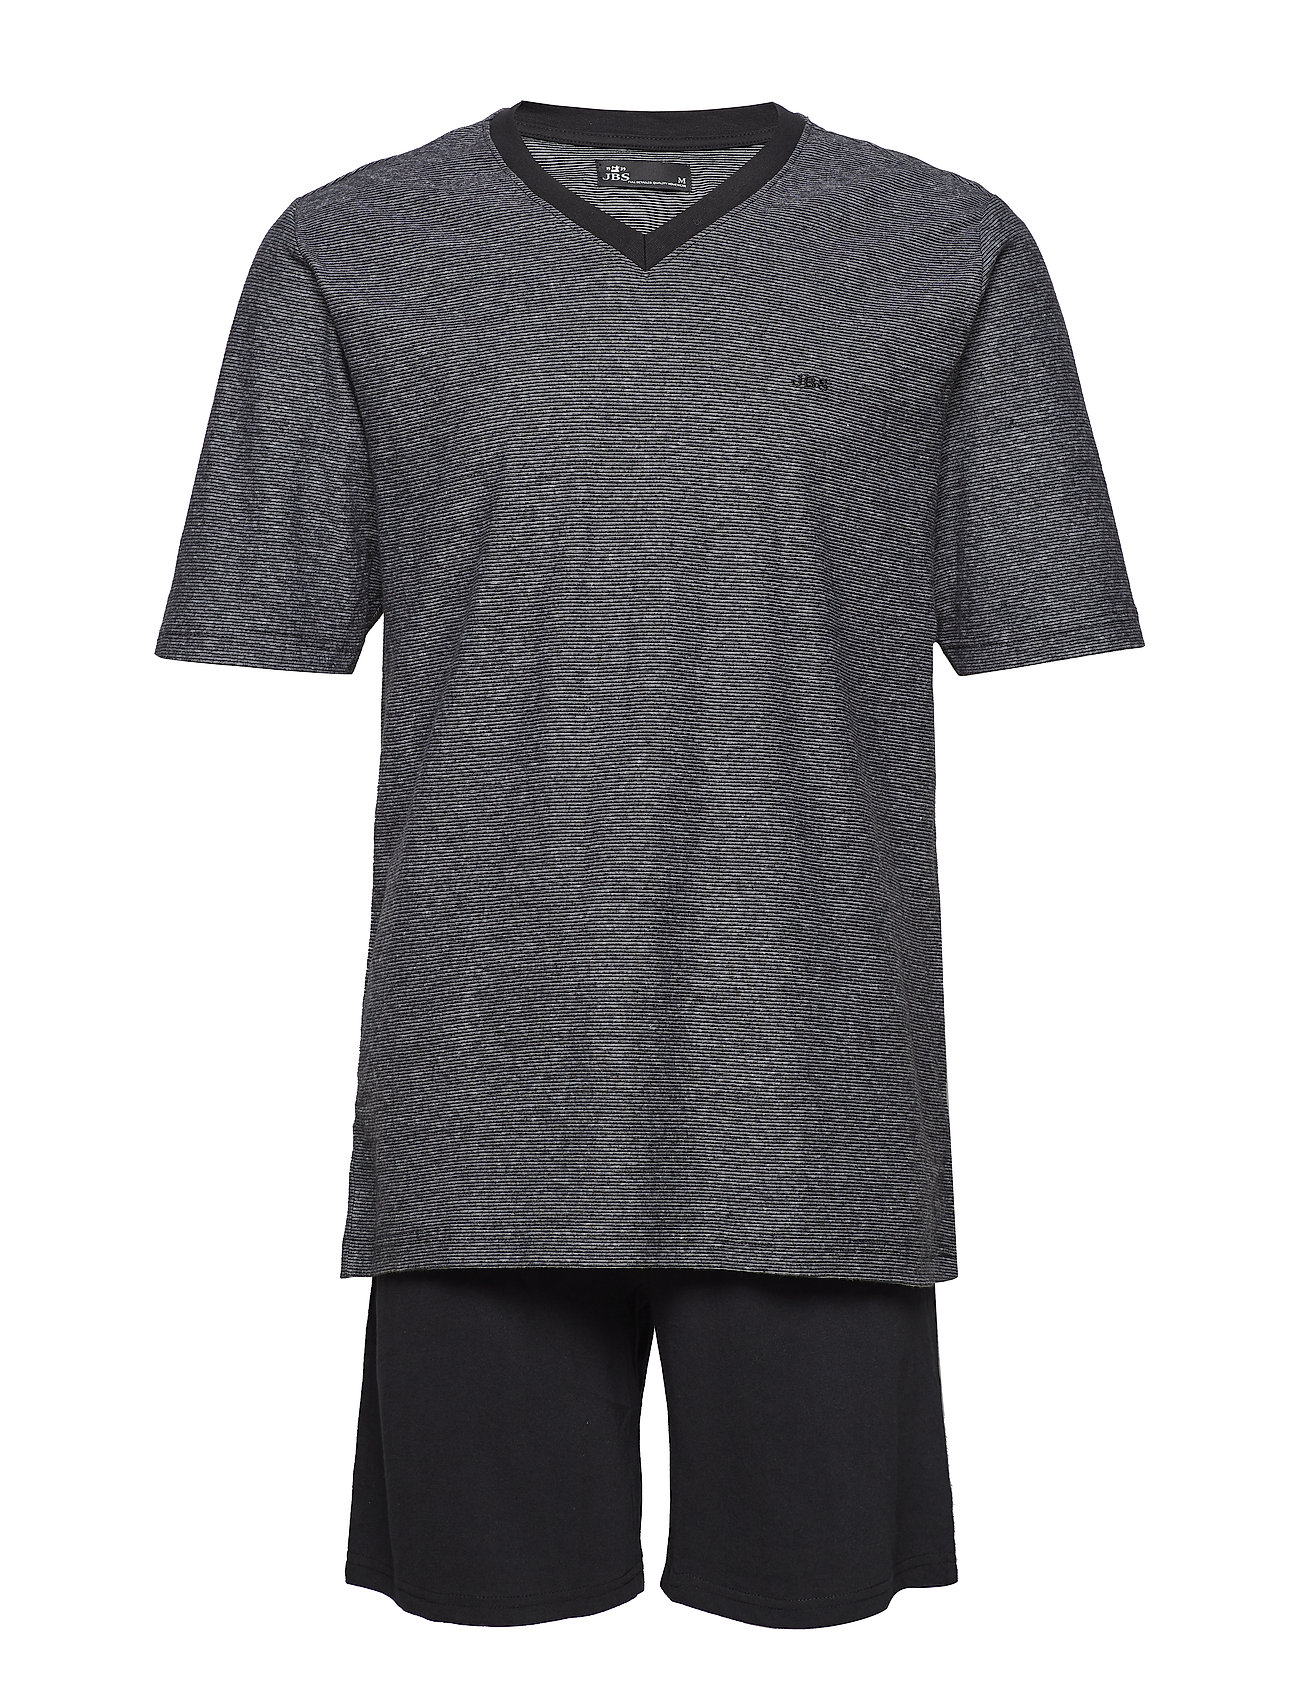 JBS JBS pyjamas t-shirt and shorts - BLACK